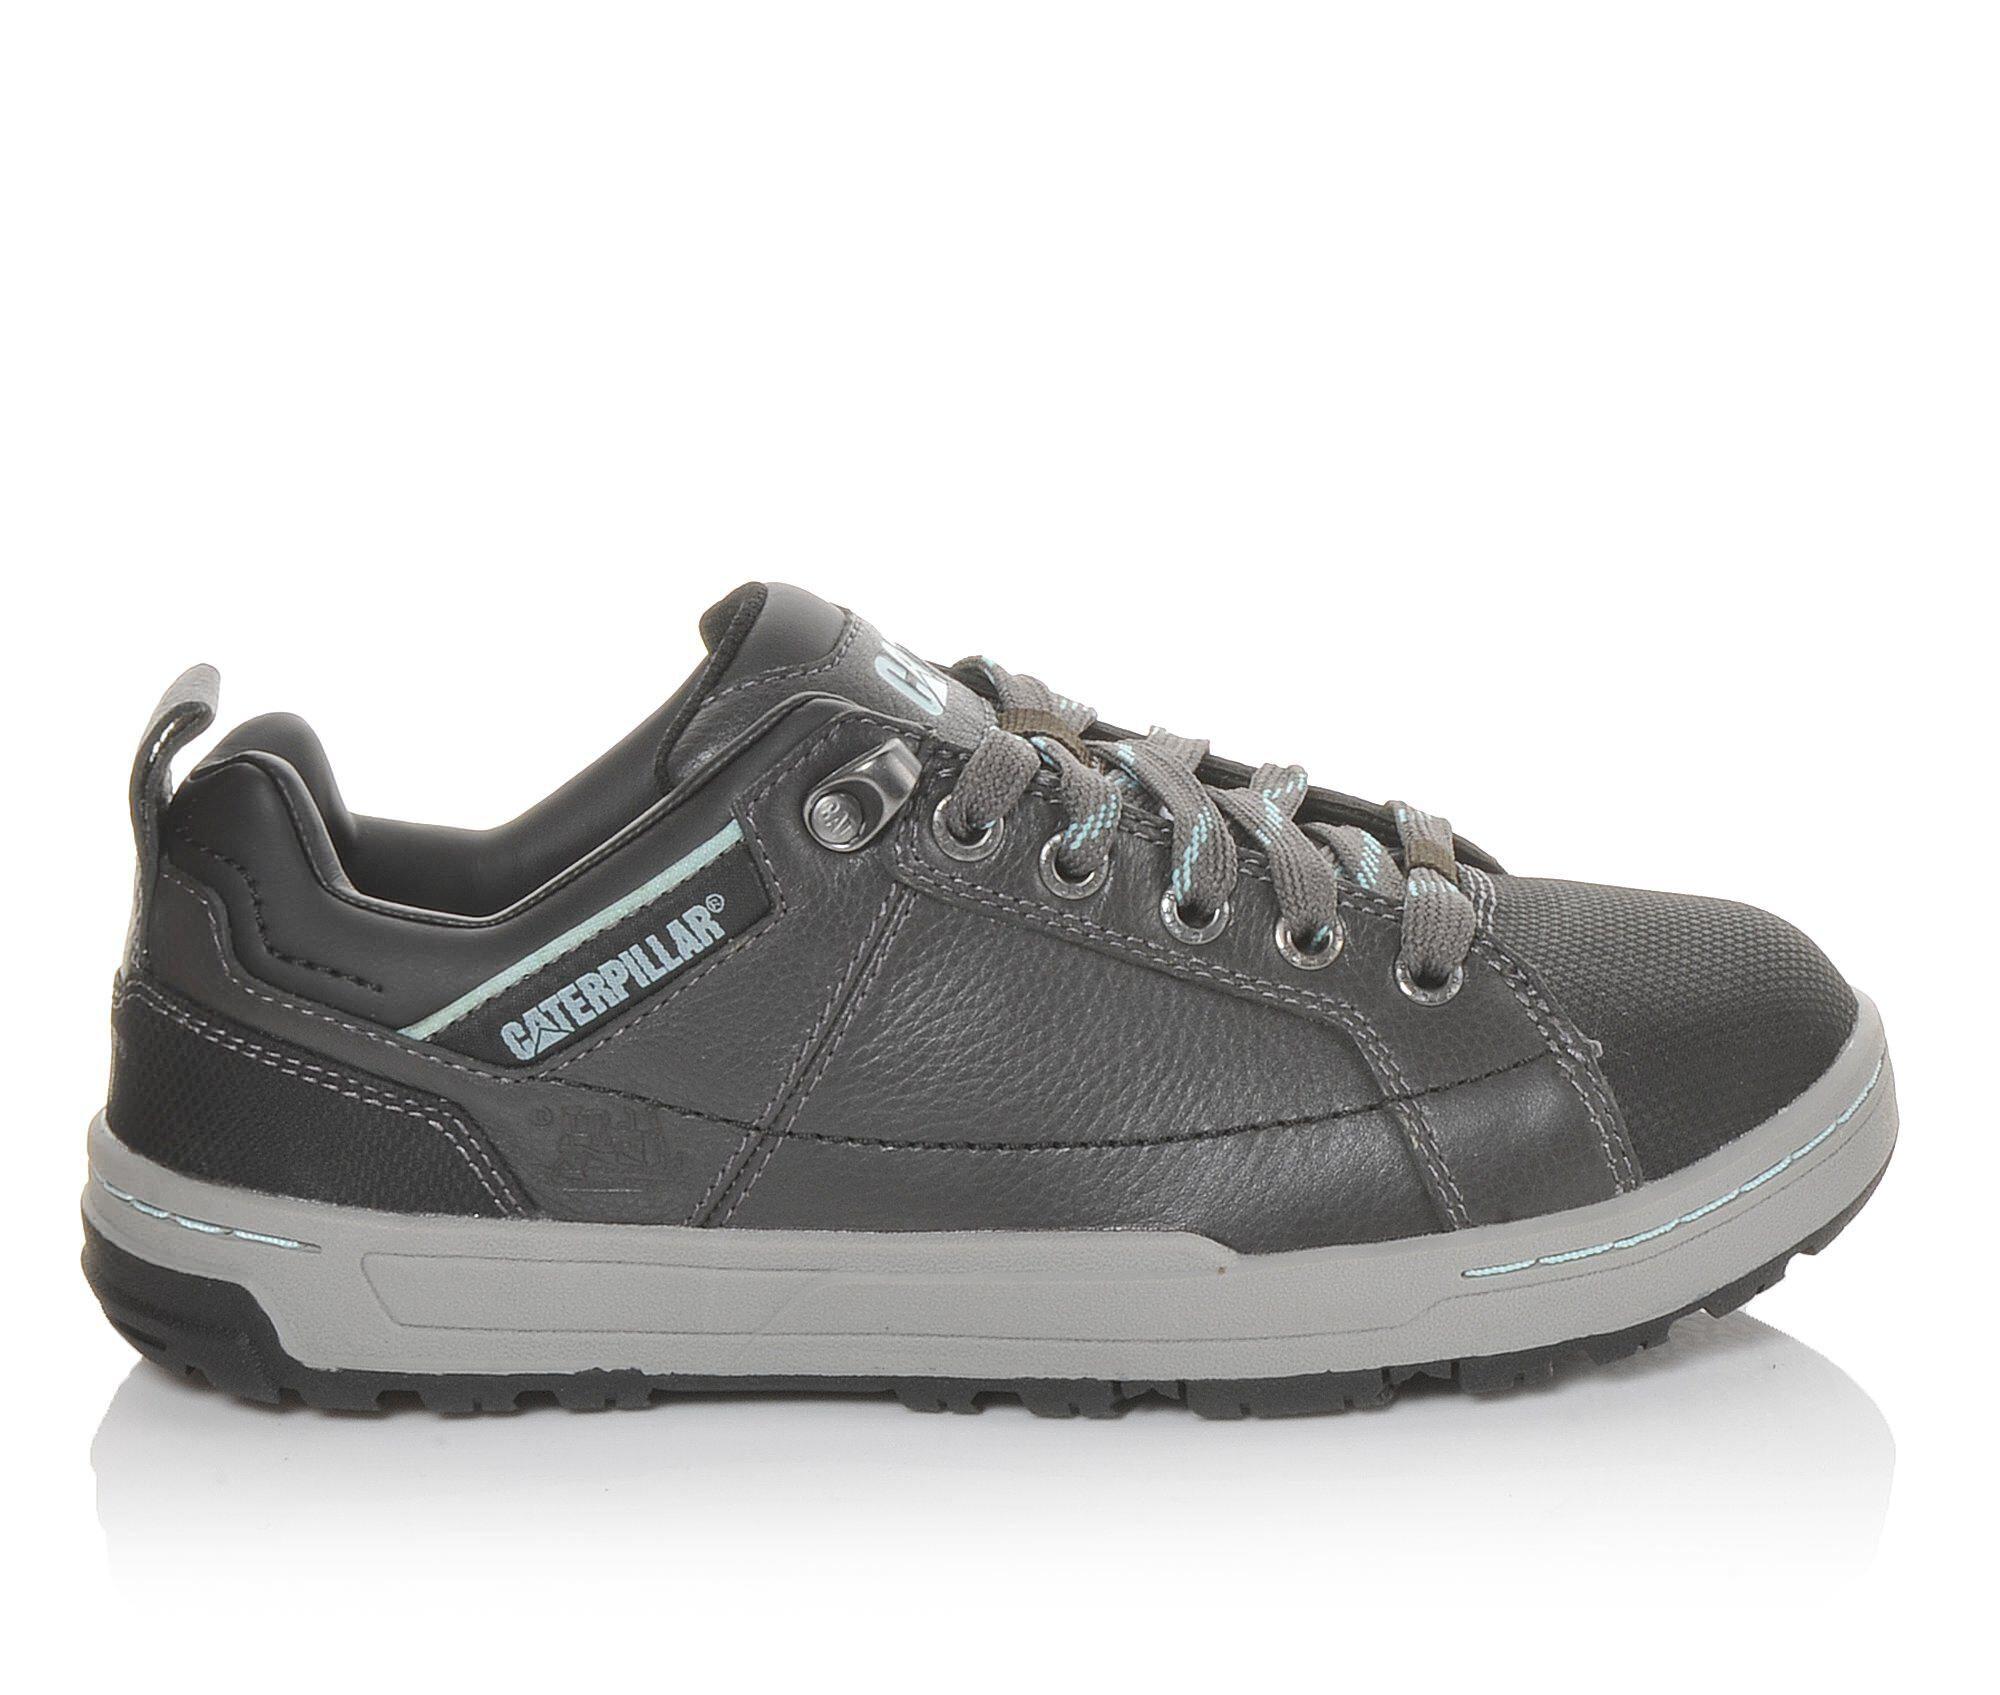 choose authentic Women's Caterpillar Brode Steel Toe Oxford Work Shoes Dark Grey